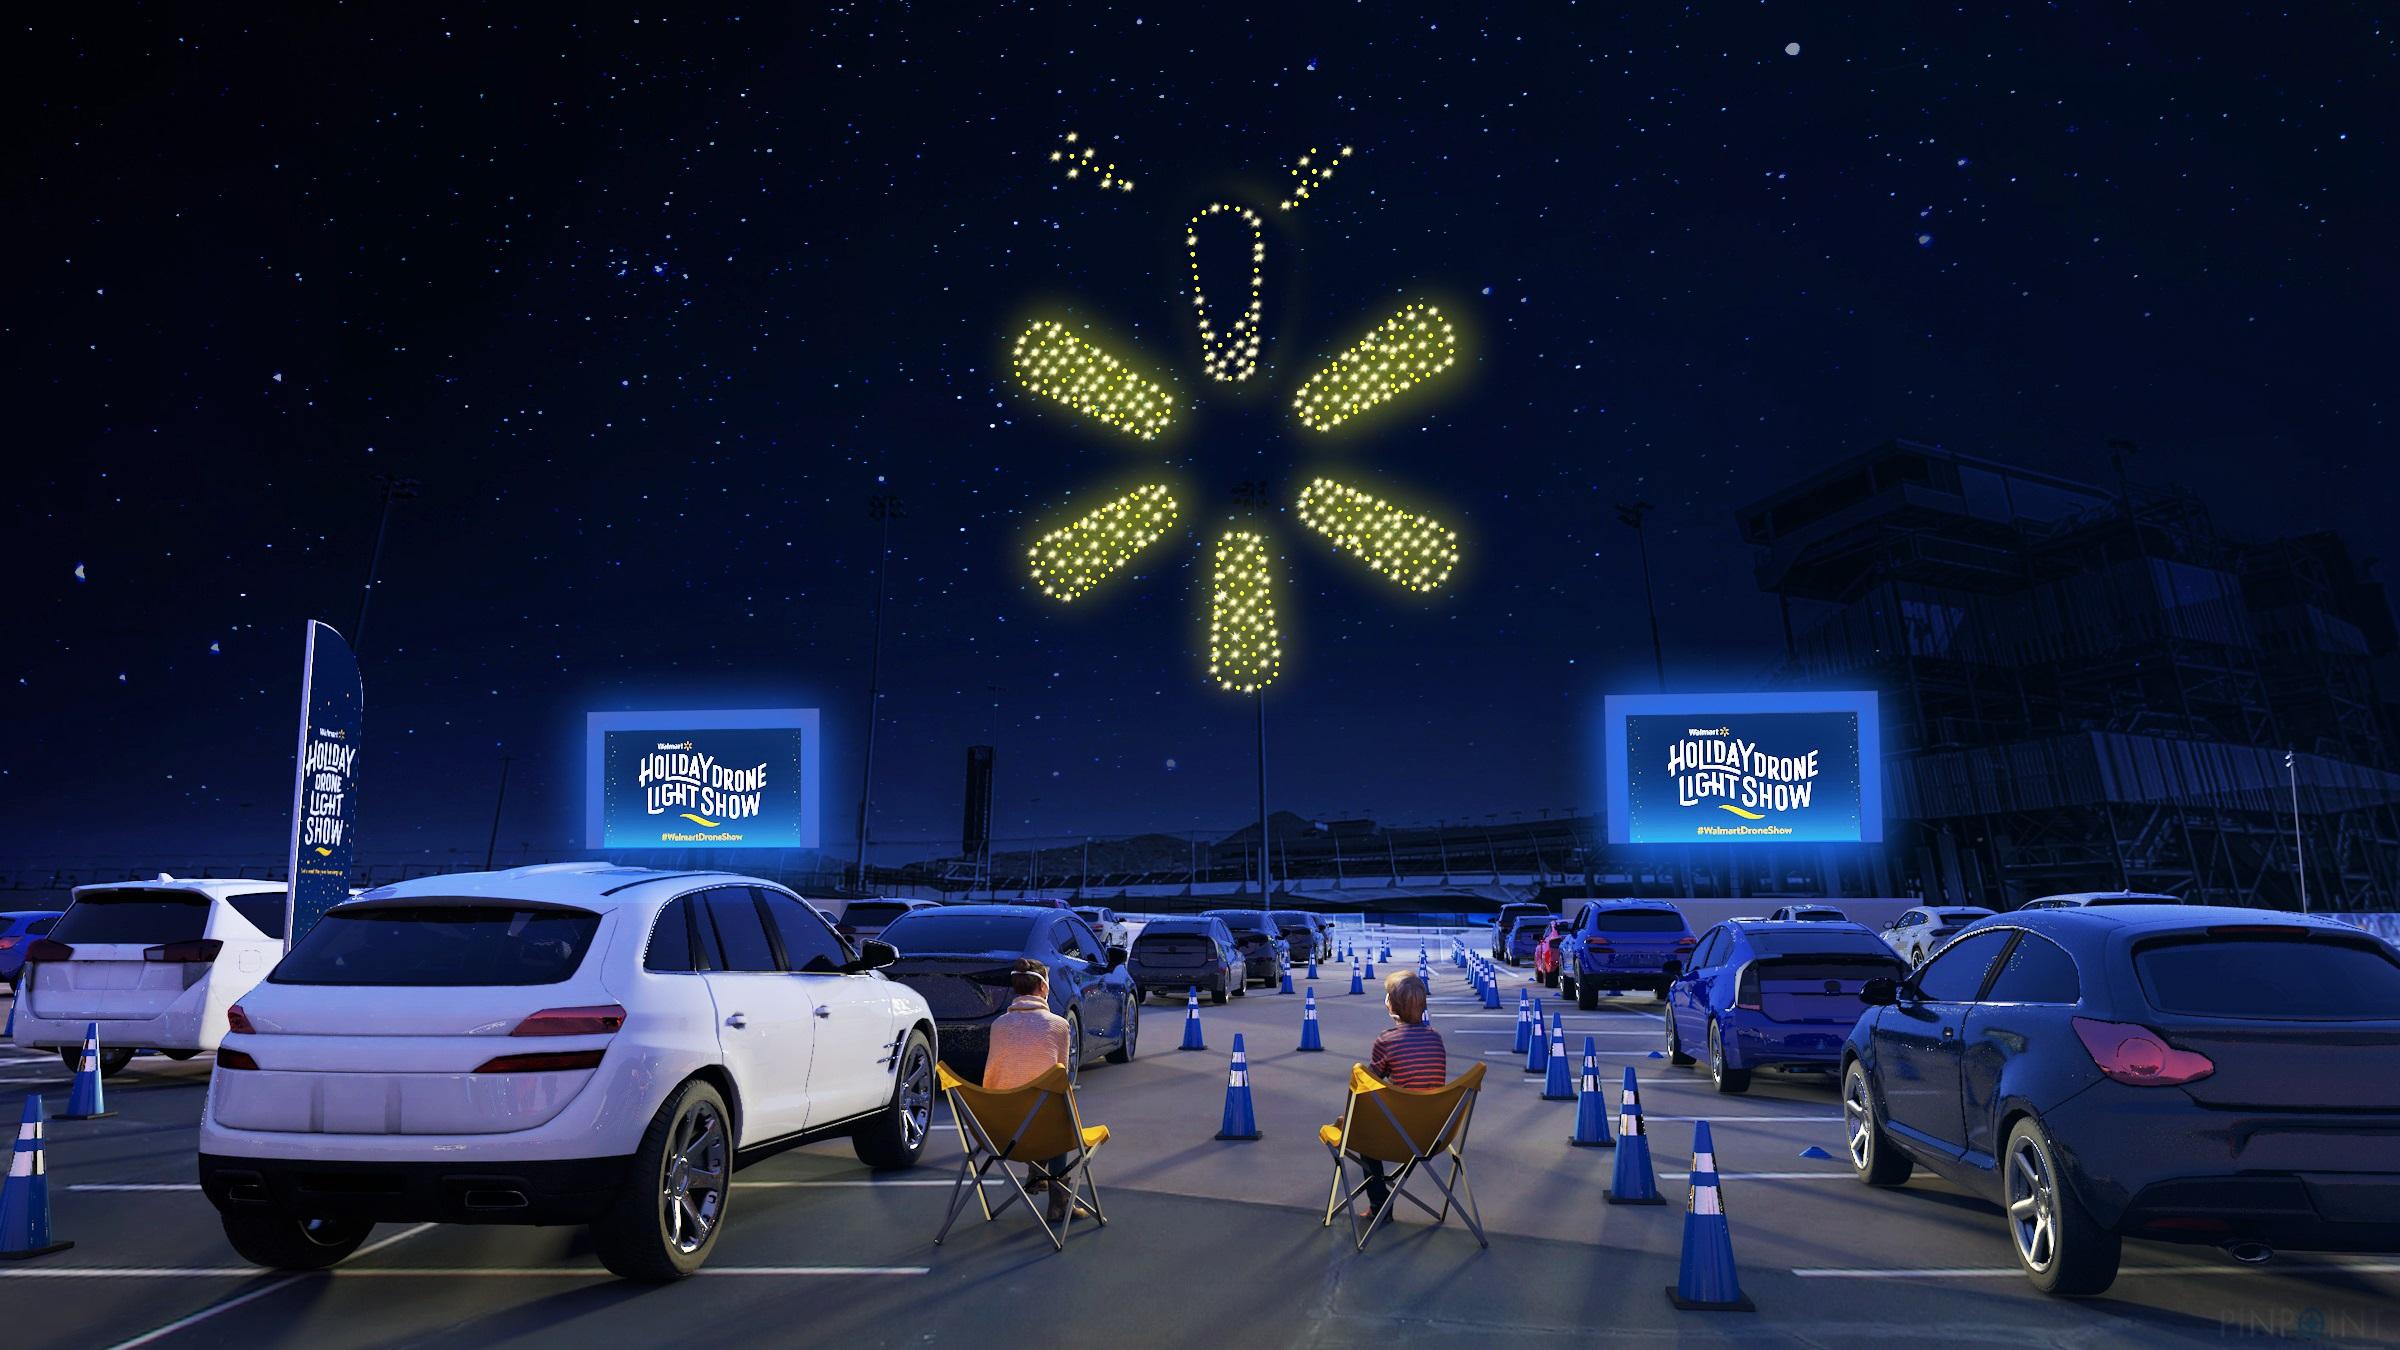 Kansas City Christmas Show Nov 2021 Walmart Lights Up The Sky With All New Holiday Drone Light Show